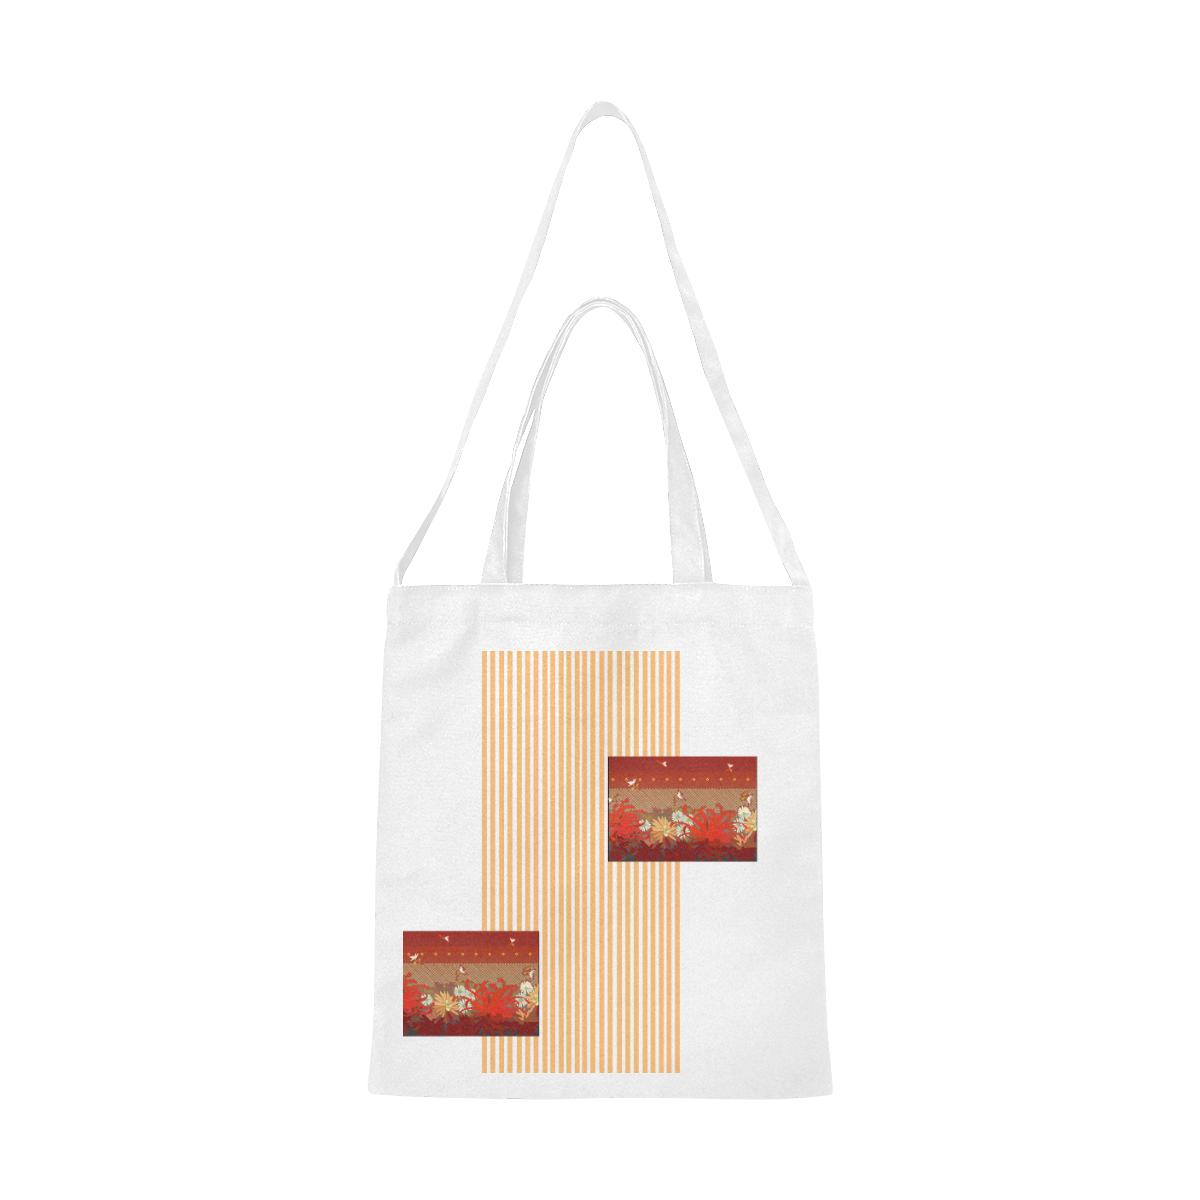 Kigrun by Vaatekaappi Canvas Tote Bag/Medium (Model 1701)